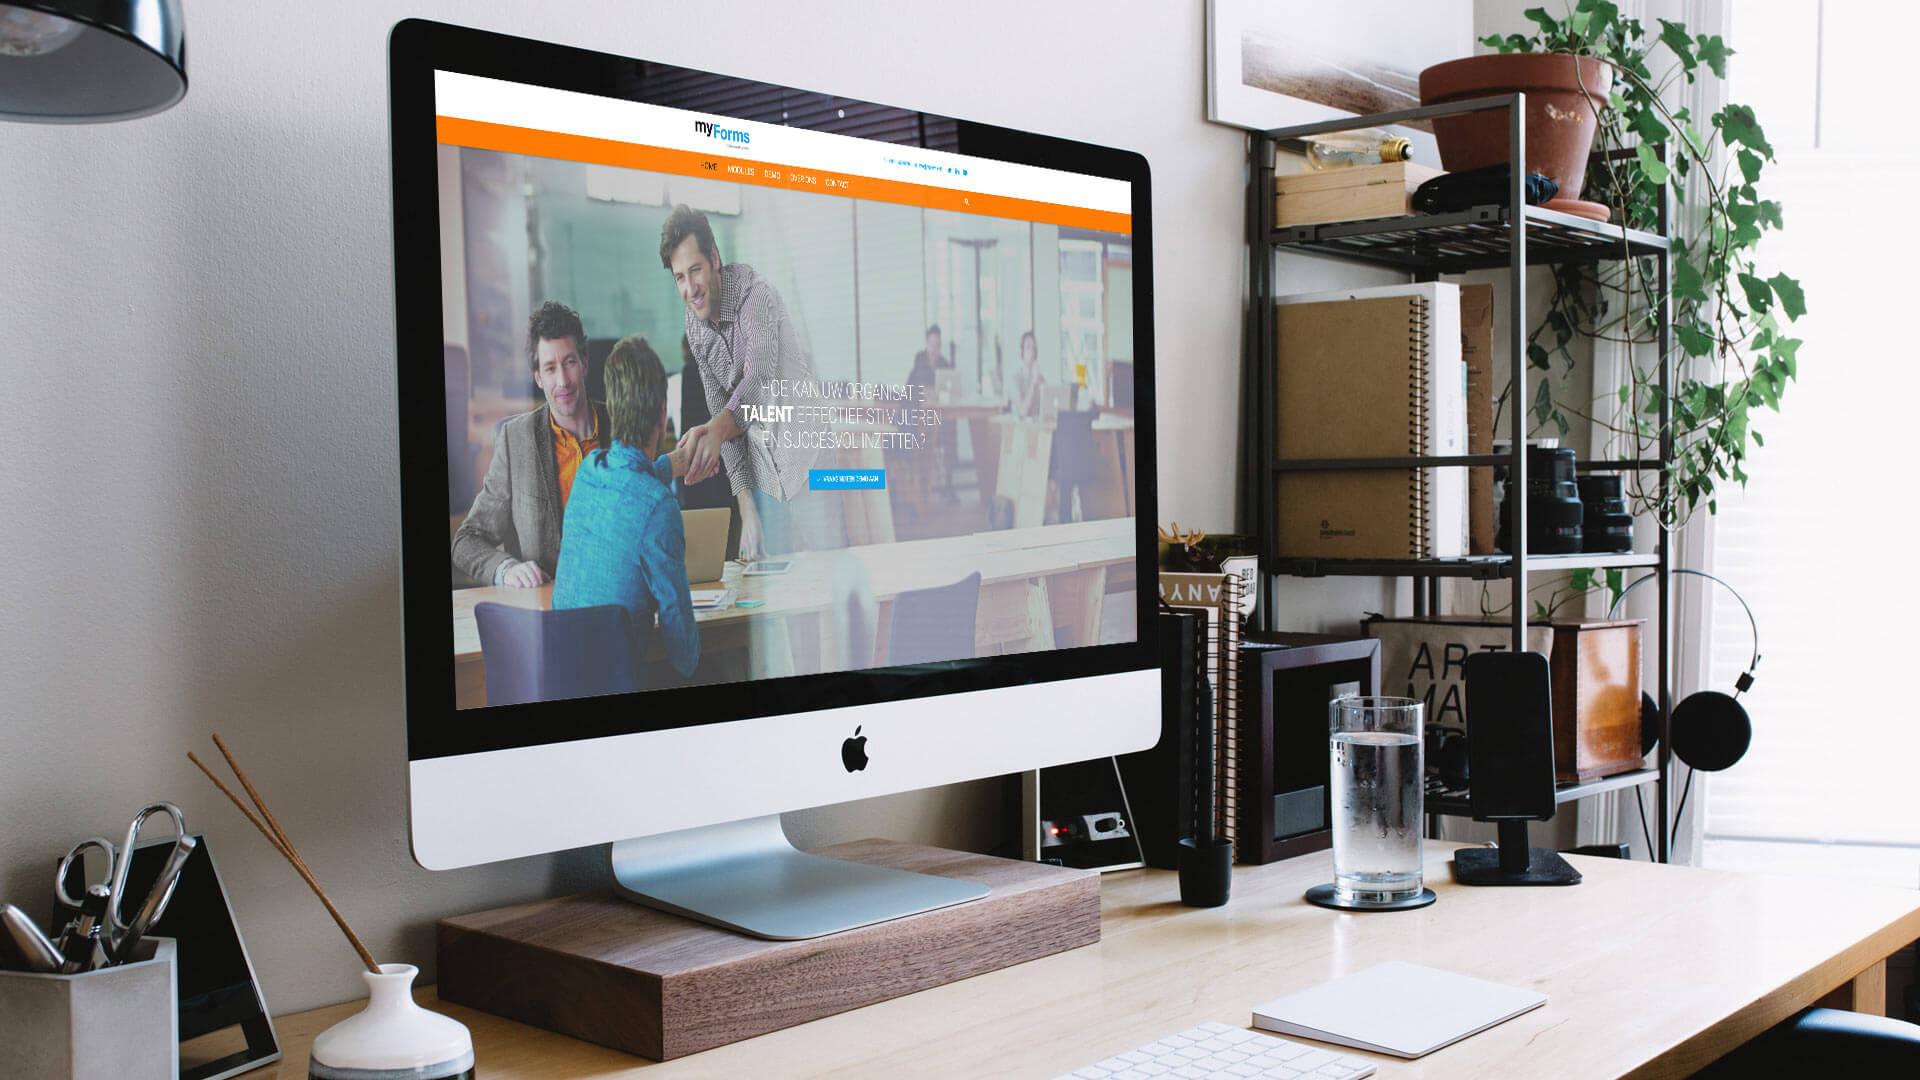 website laten maken, ux designer, website laten maken Rotterdam, grafisch ontwerper